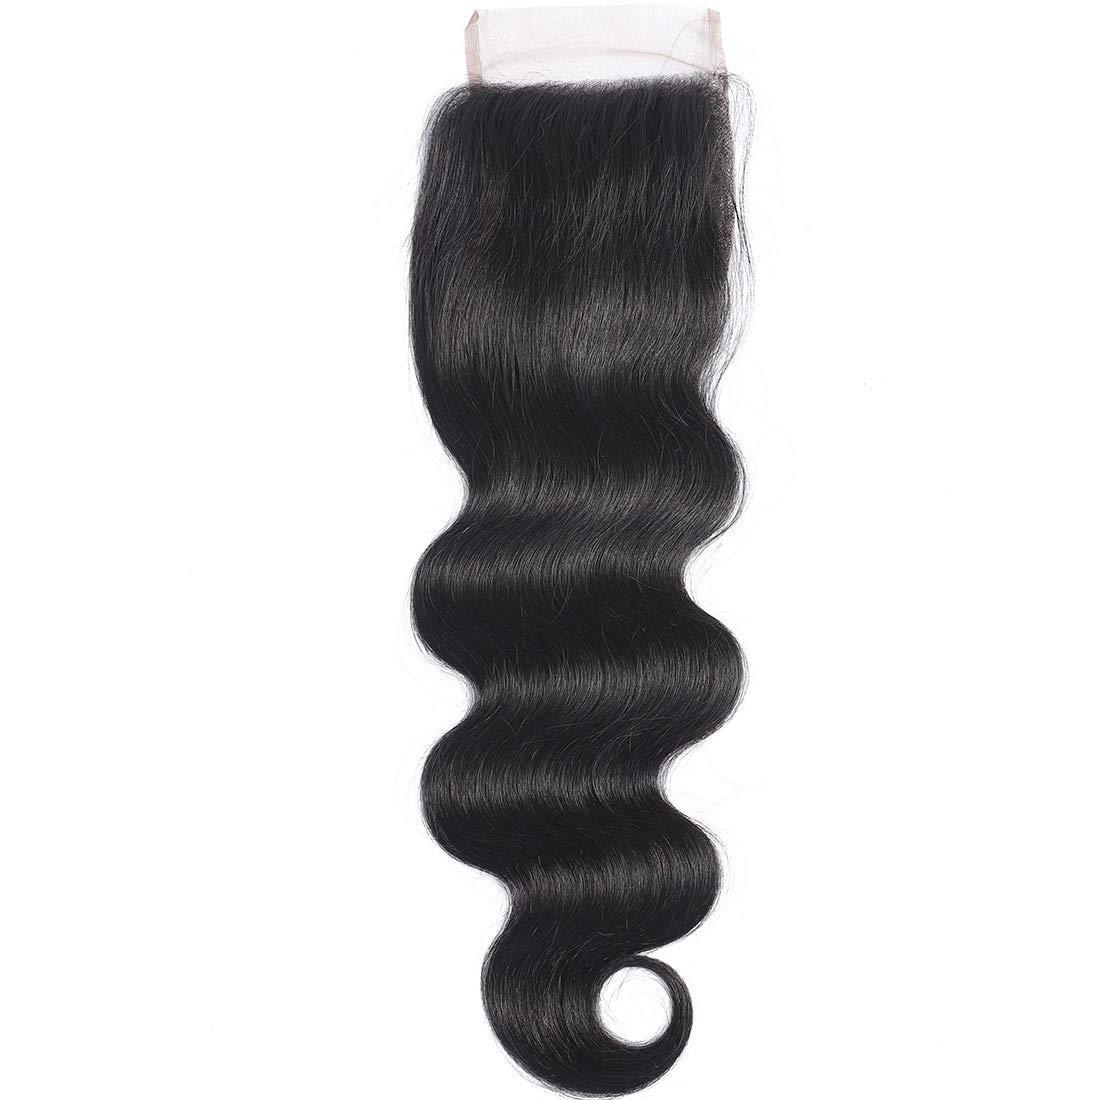 Misoun Hair Free テレビで話題 Part Lace Closure 4x4 Brazilian Virgi Wave <セール&特集> Body